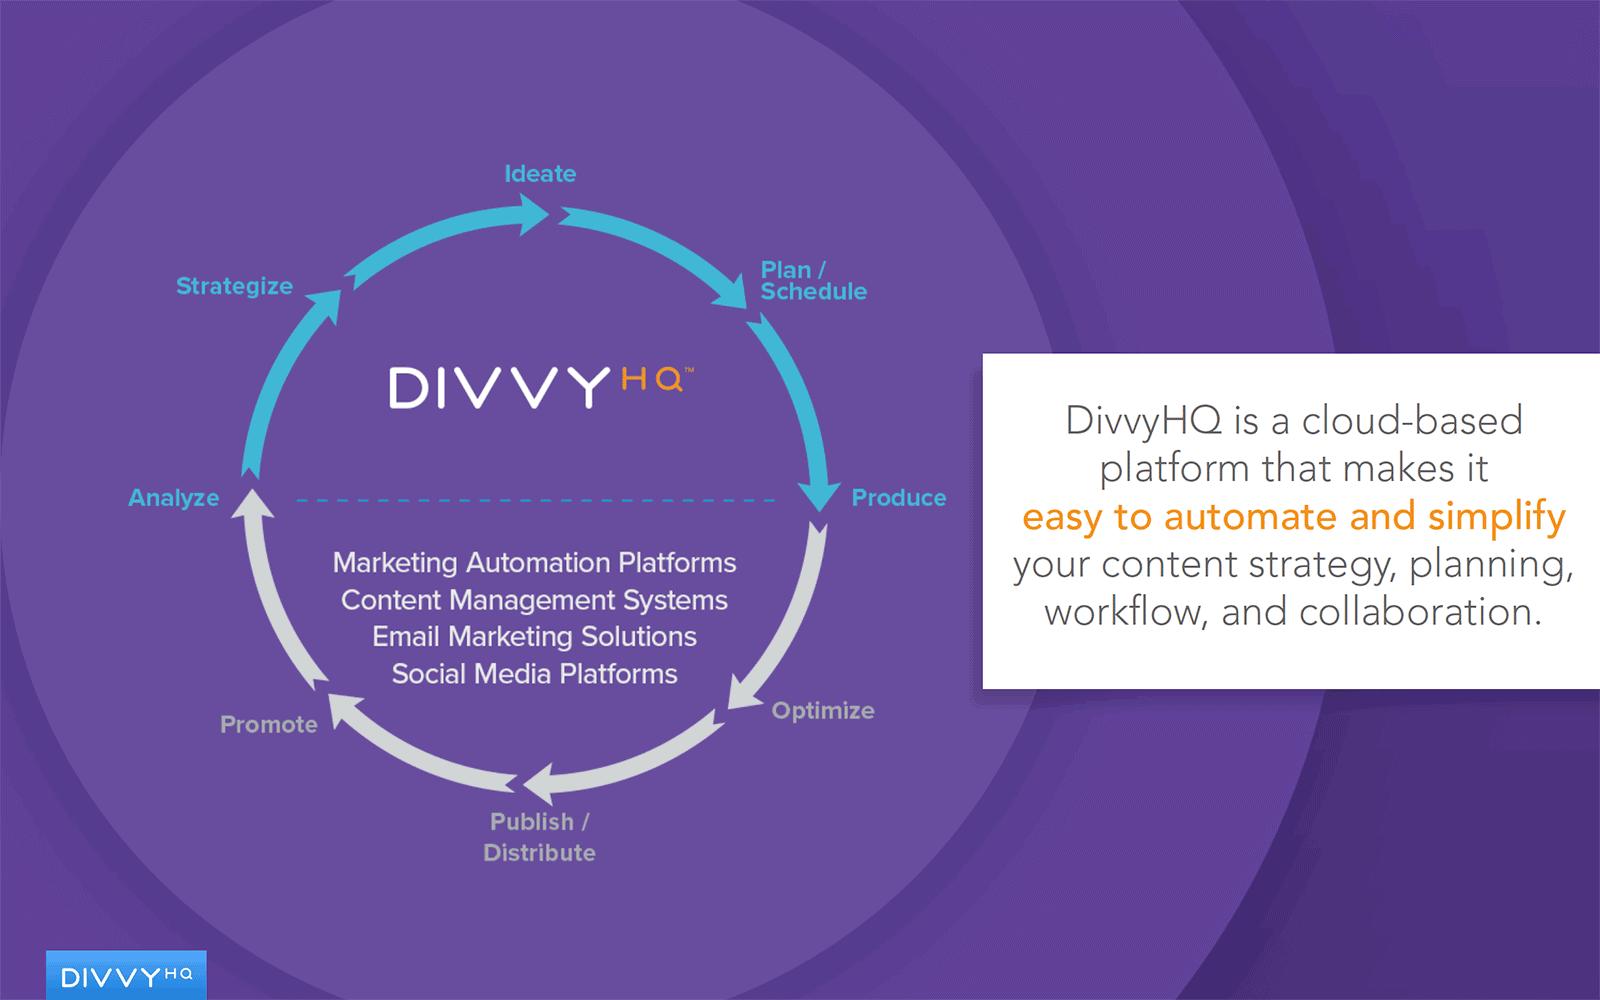 divvyhq content marketing process workflow